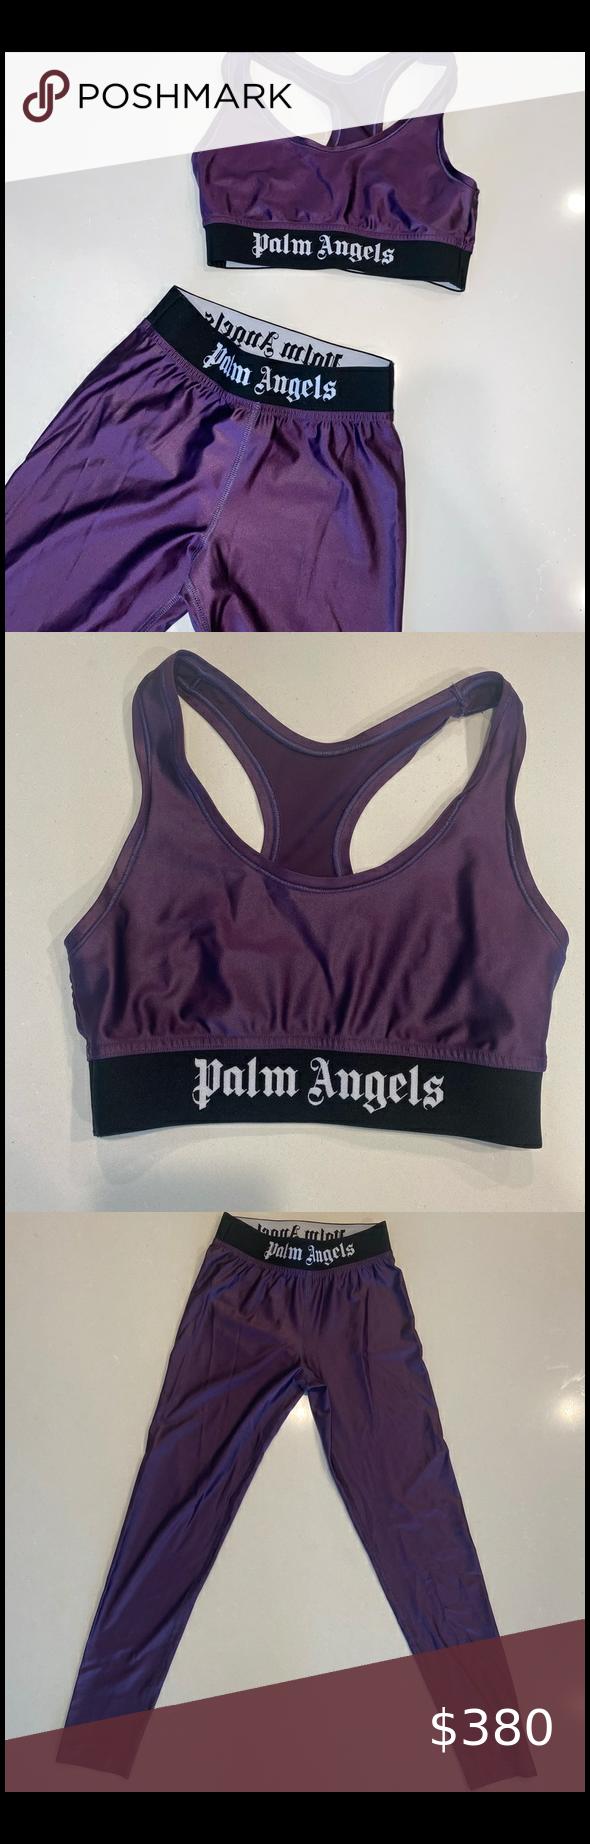 palm angels tracksuit purple